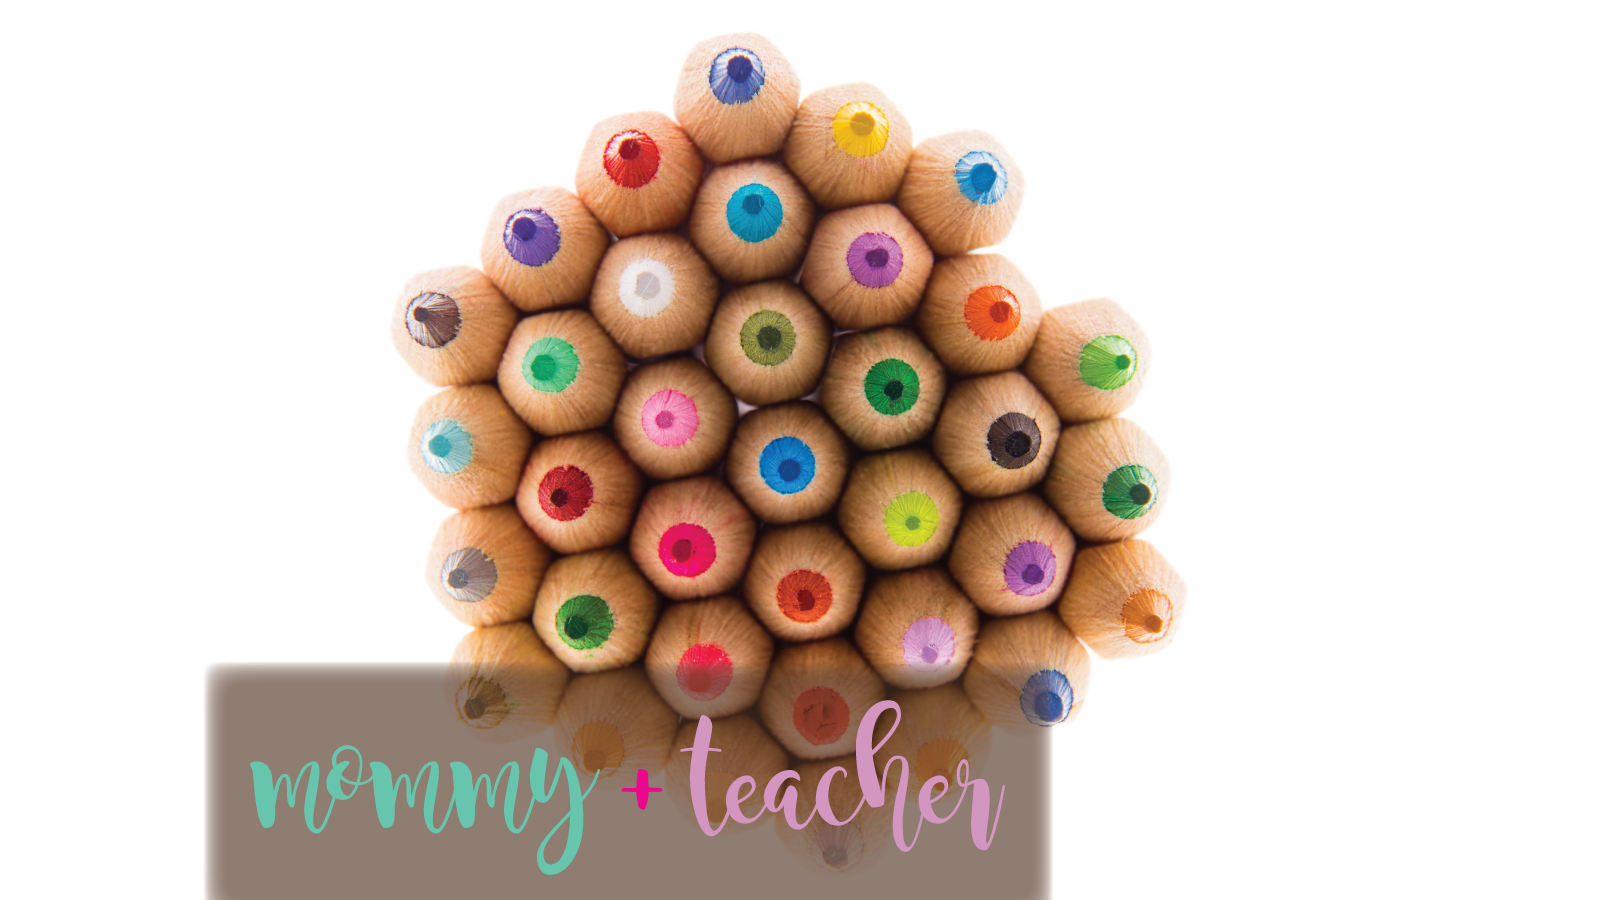 teacher_vive